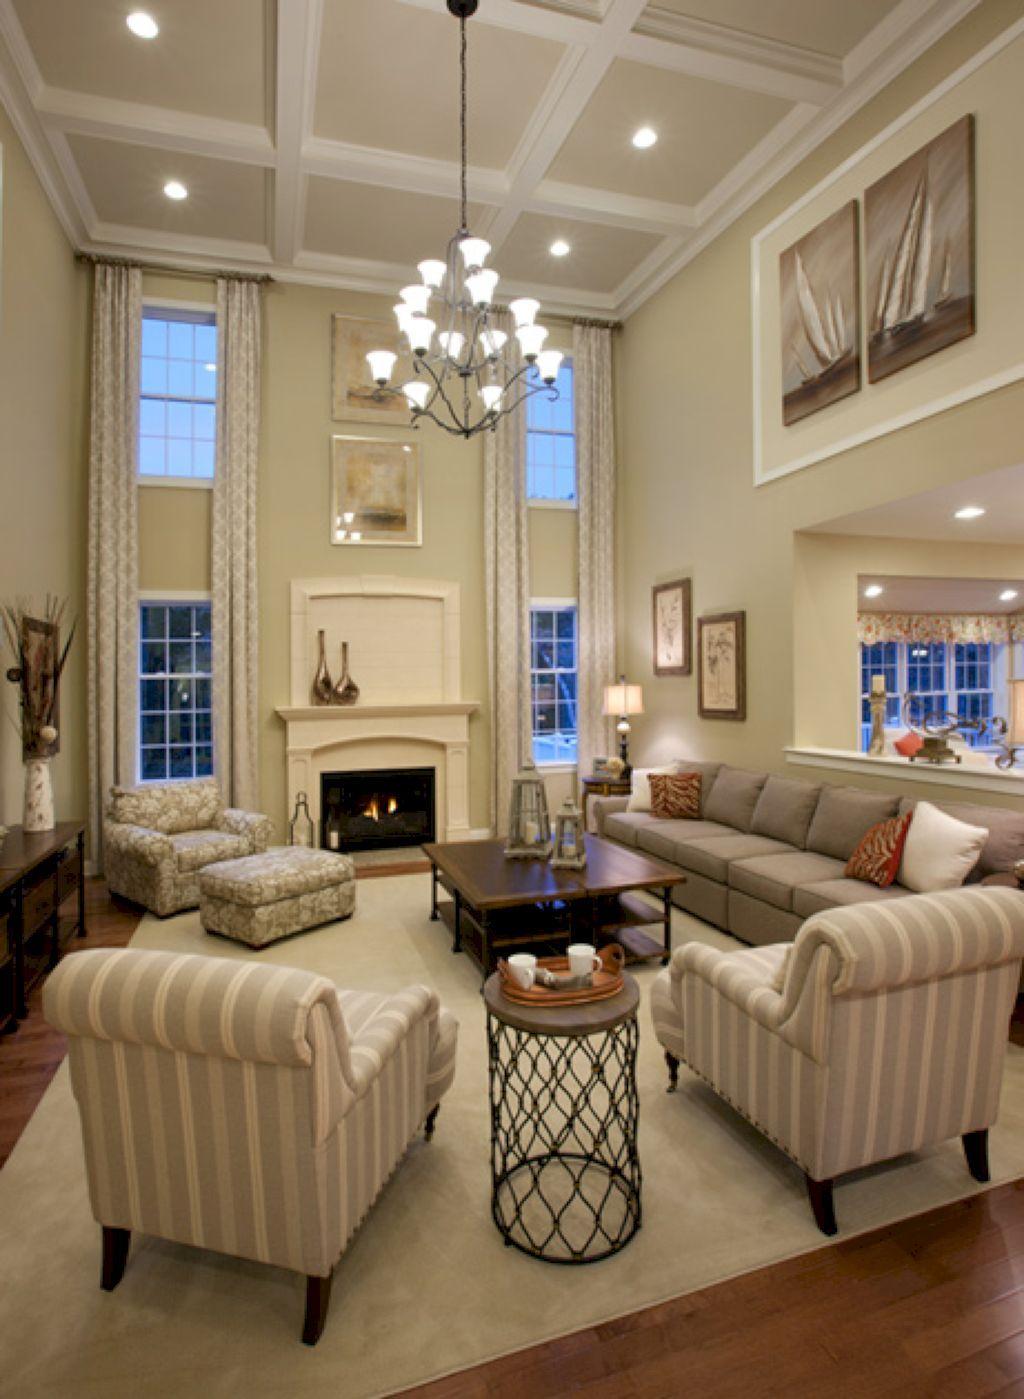 35 Elegant Living Room Decor Ideas High Ceiling Living